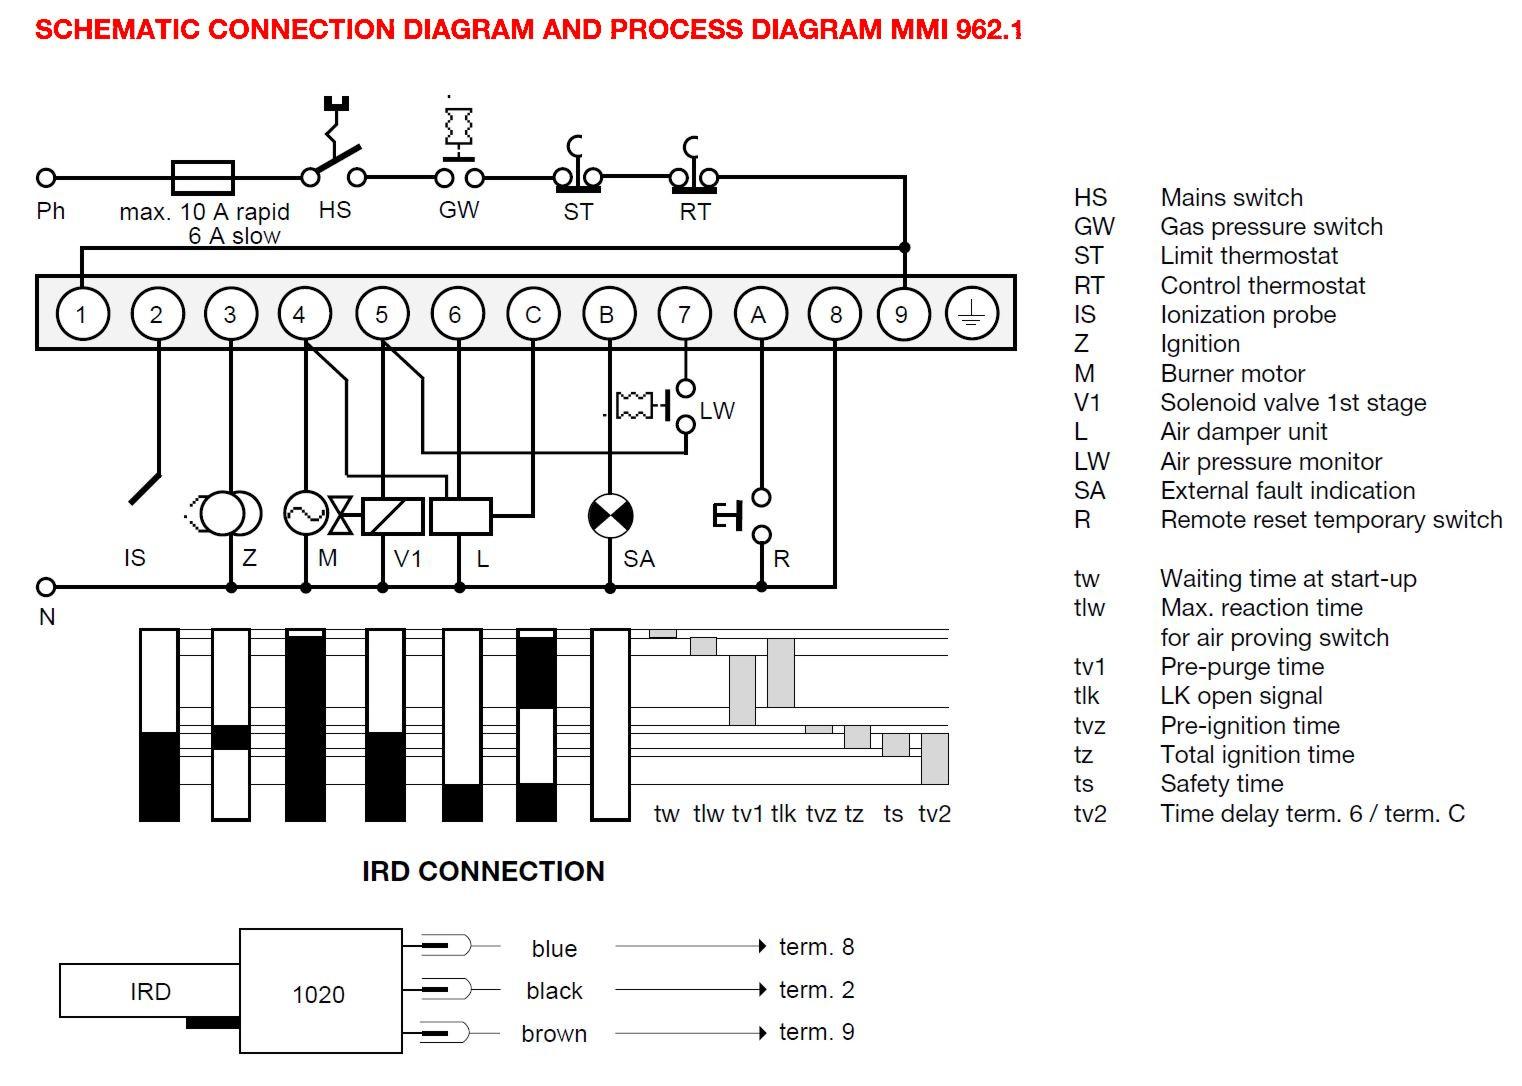 SATRONIC_MMI 962.1 mod 23_SCHEMA_ELECTRICA